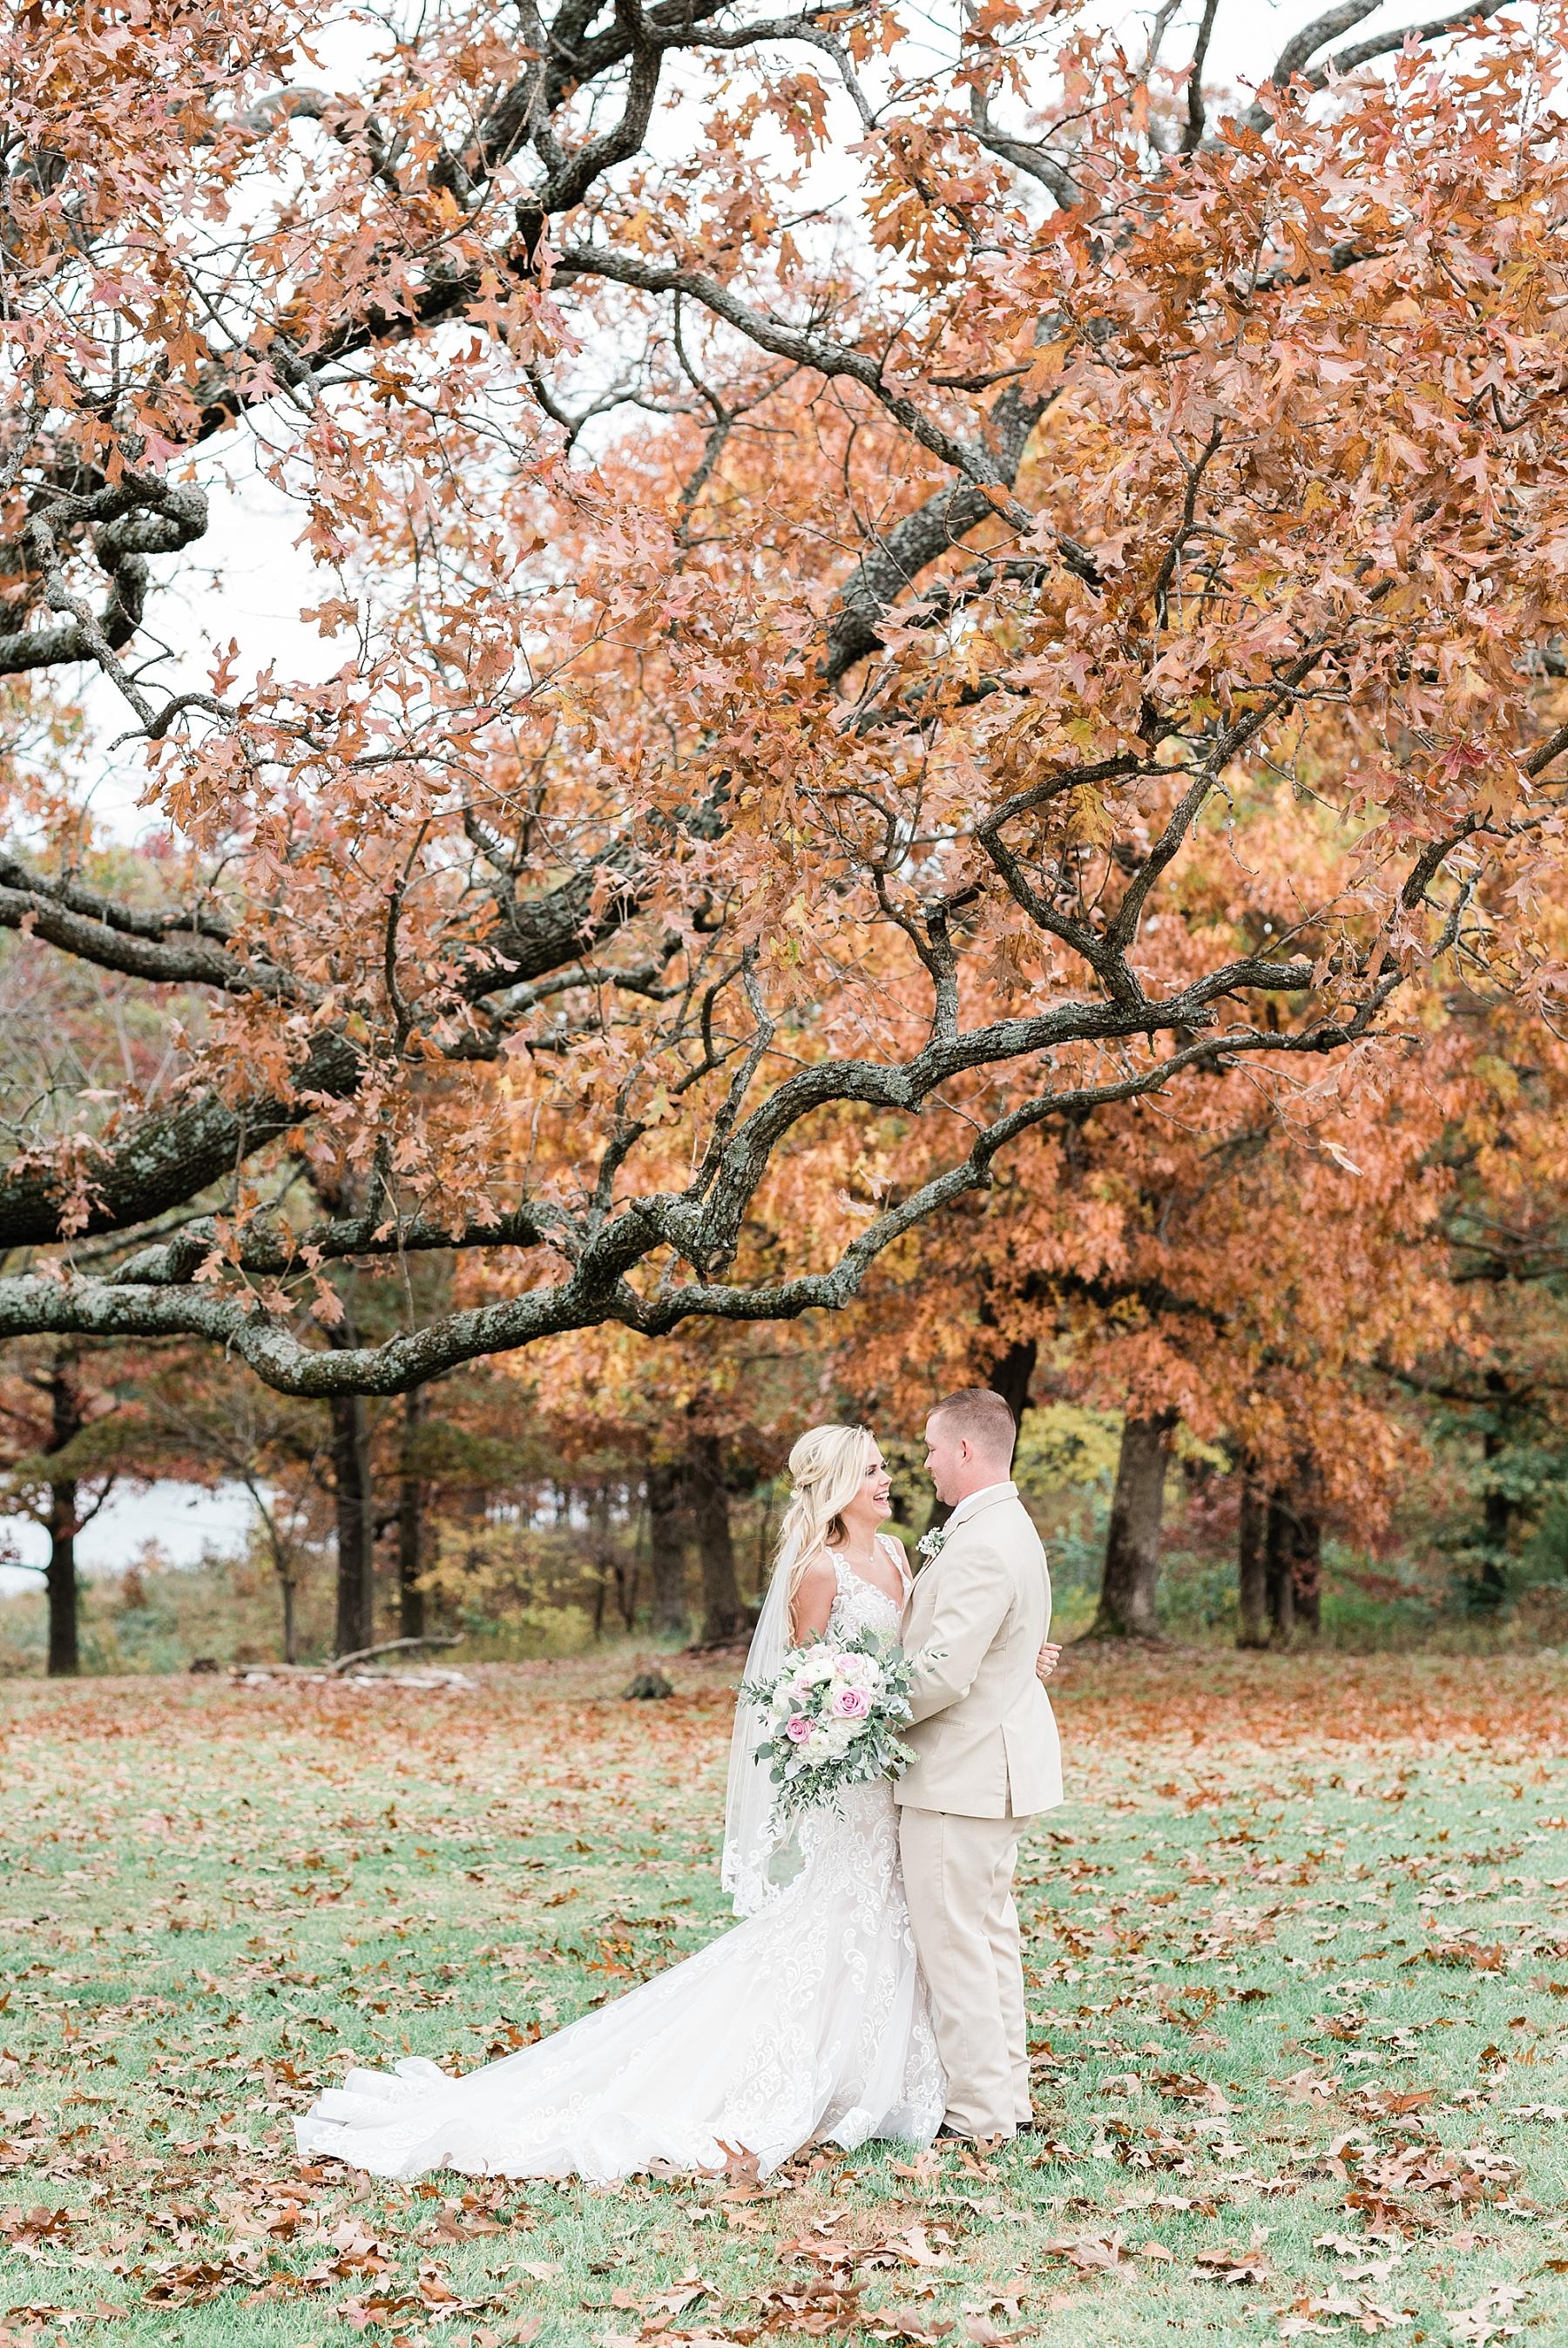 Lakeside Wedding in Fall at Mighty Oak Lodge by Misouri Wedding Photographer Kelsi Kliethermes Photography_0040.jpg